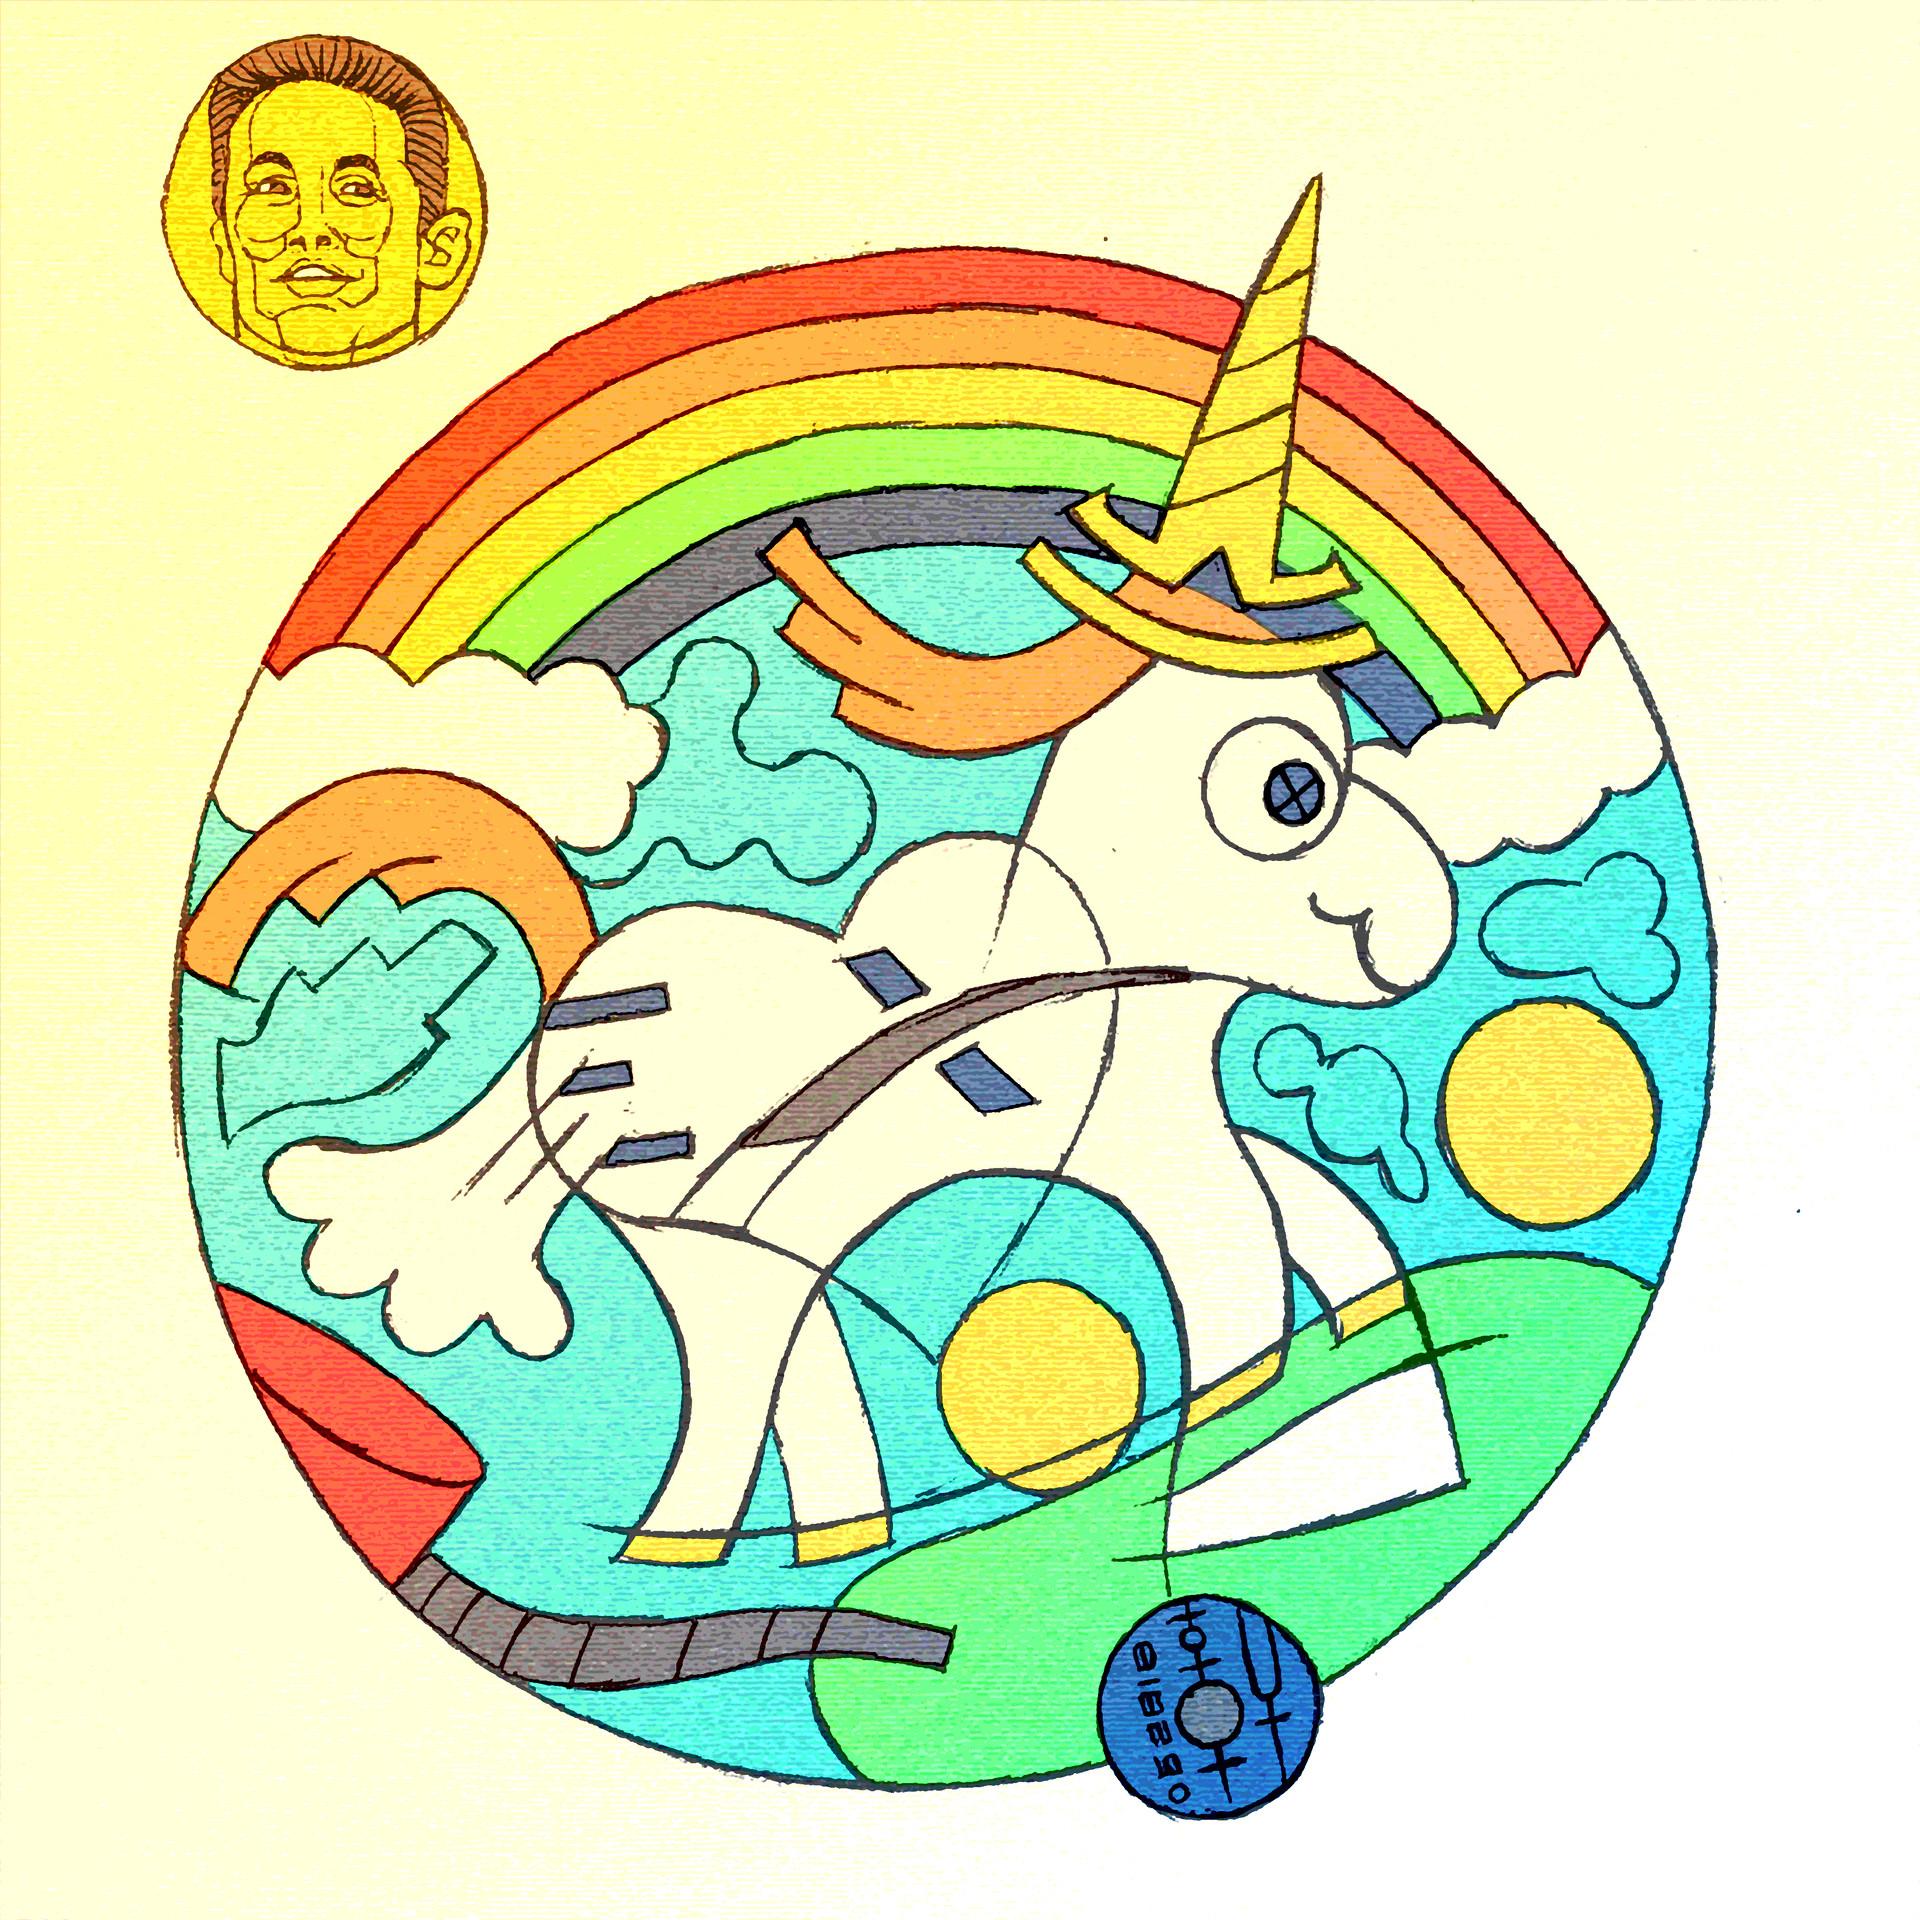 E lynx lin elonmusk unicorn